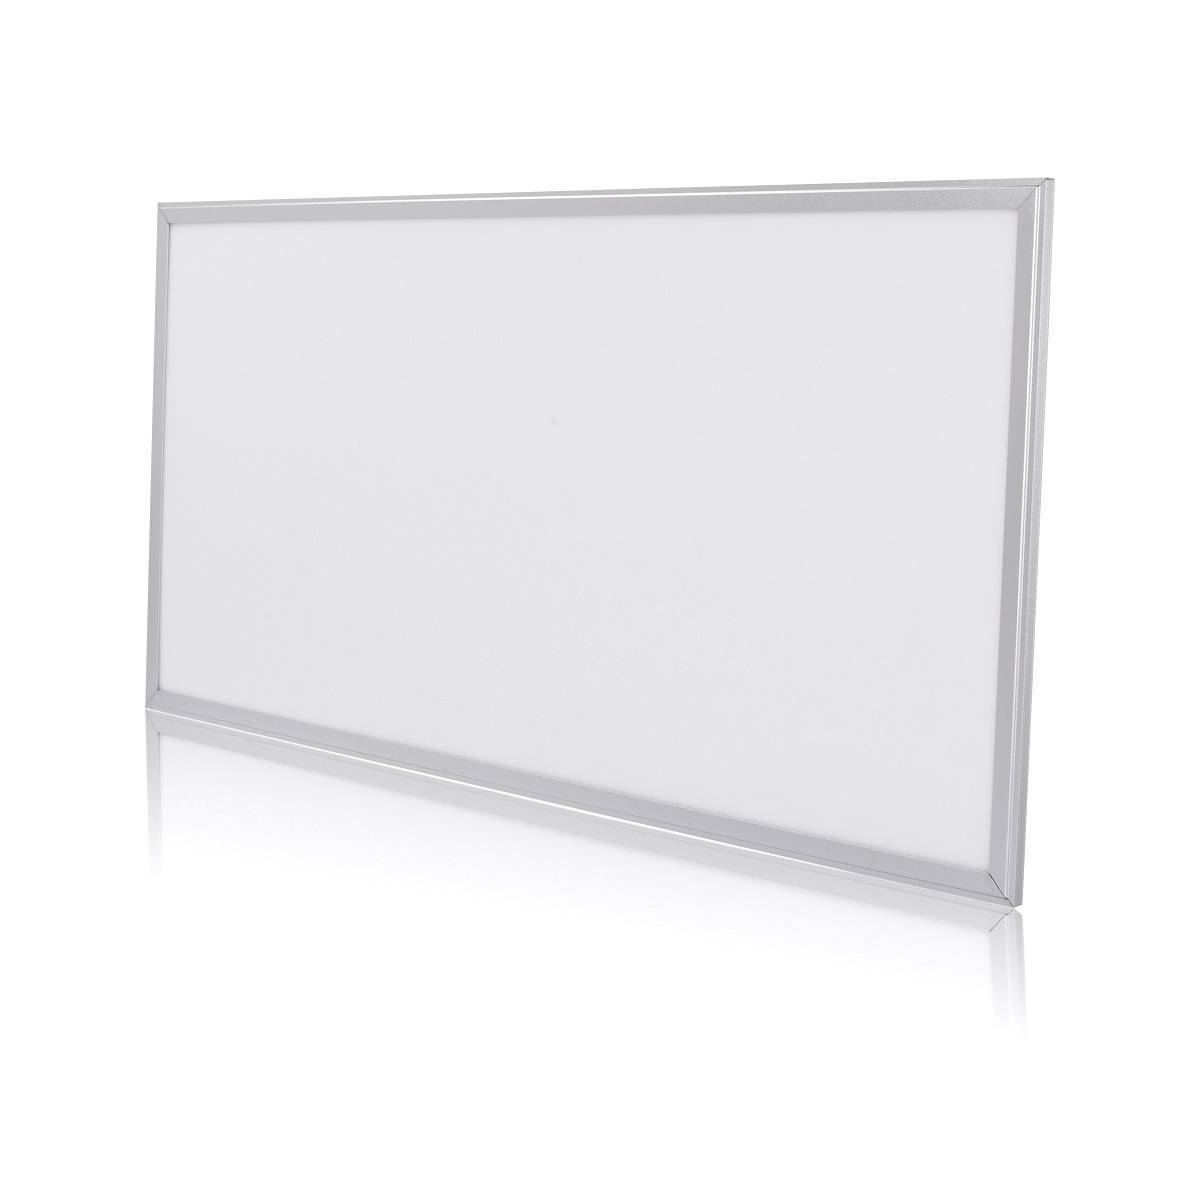 3001200 80W LED panel light